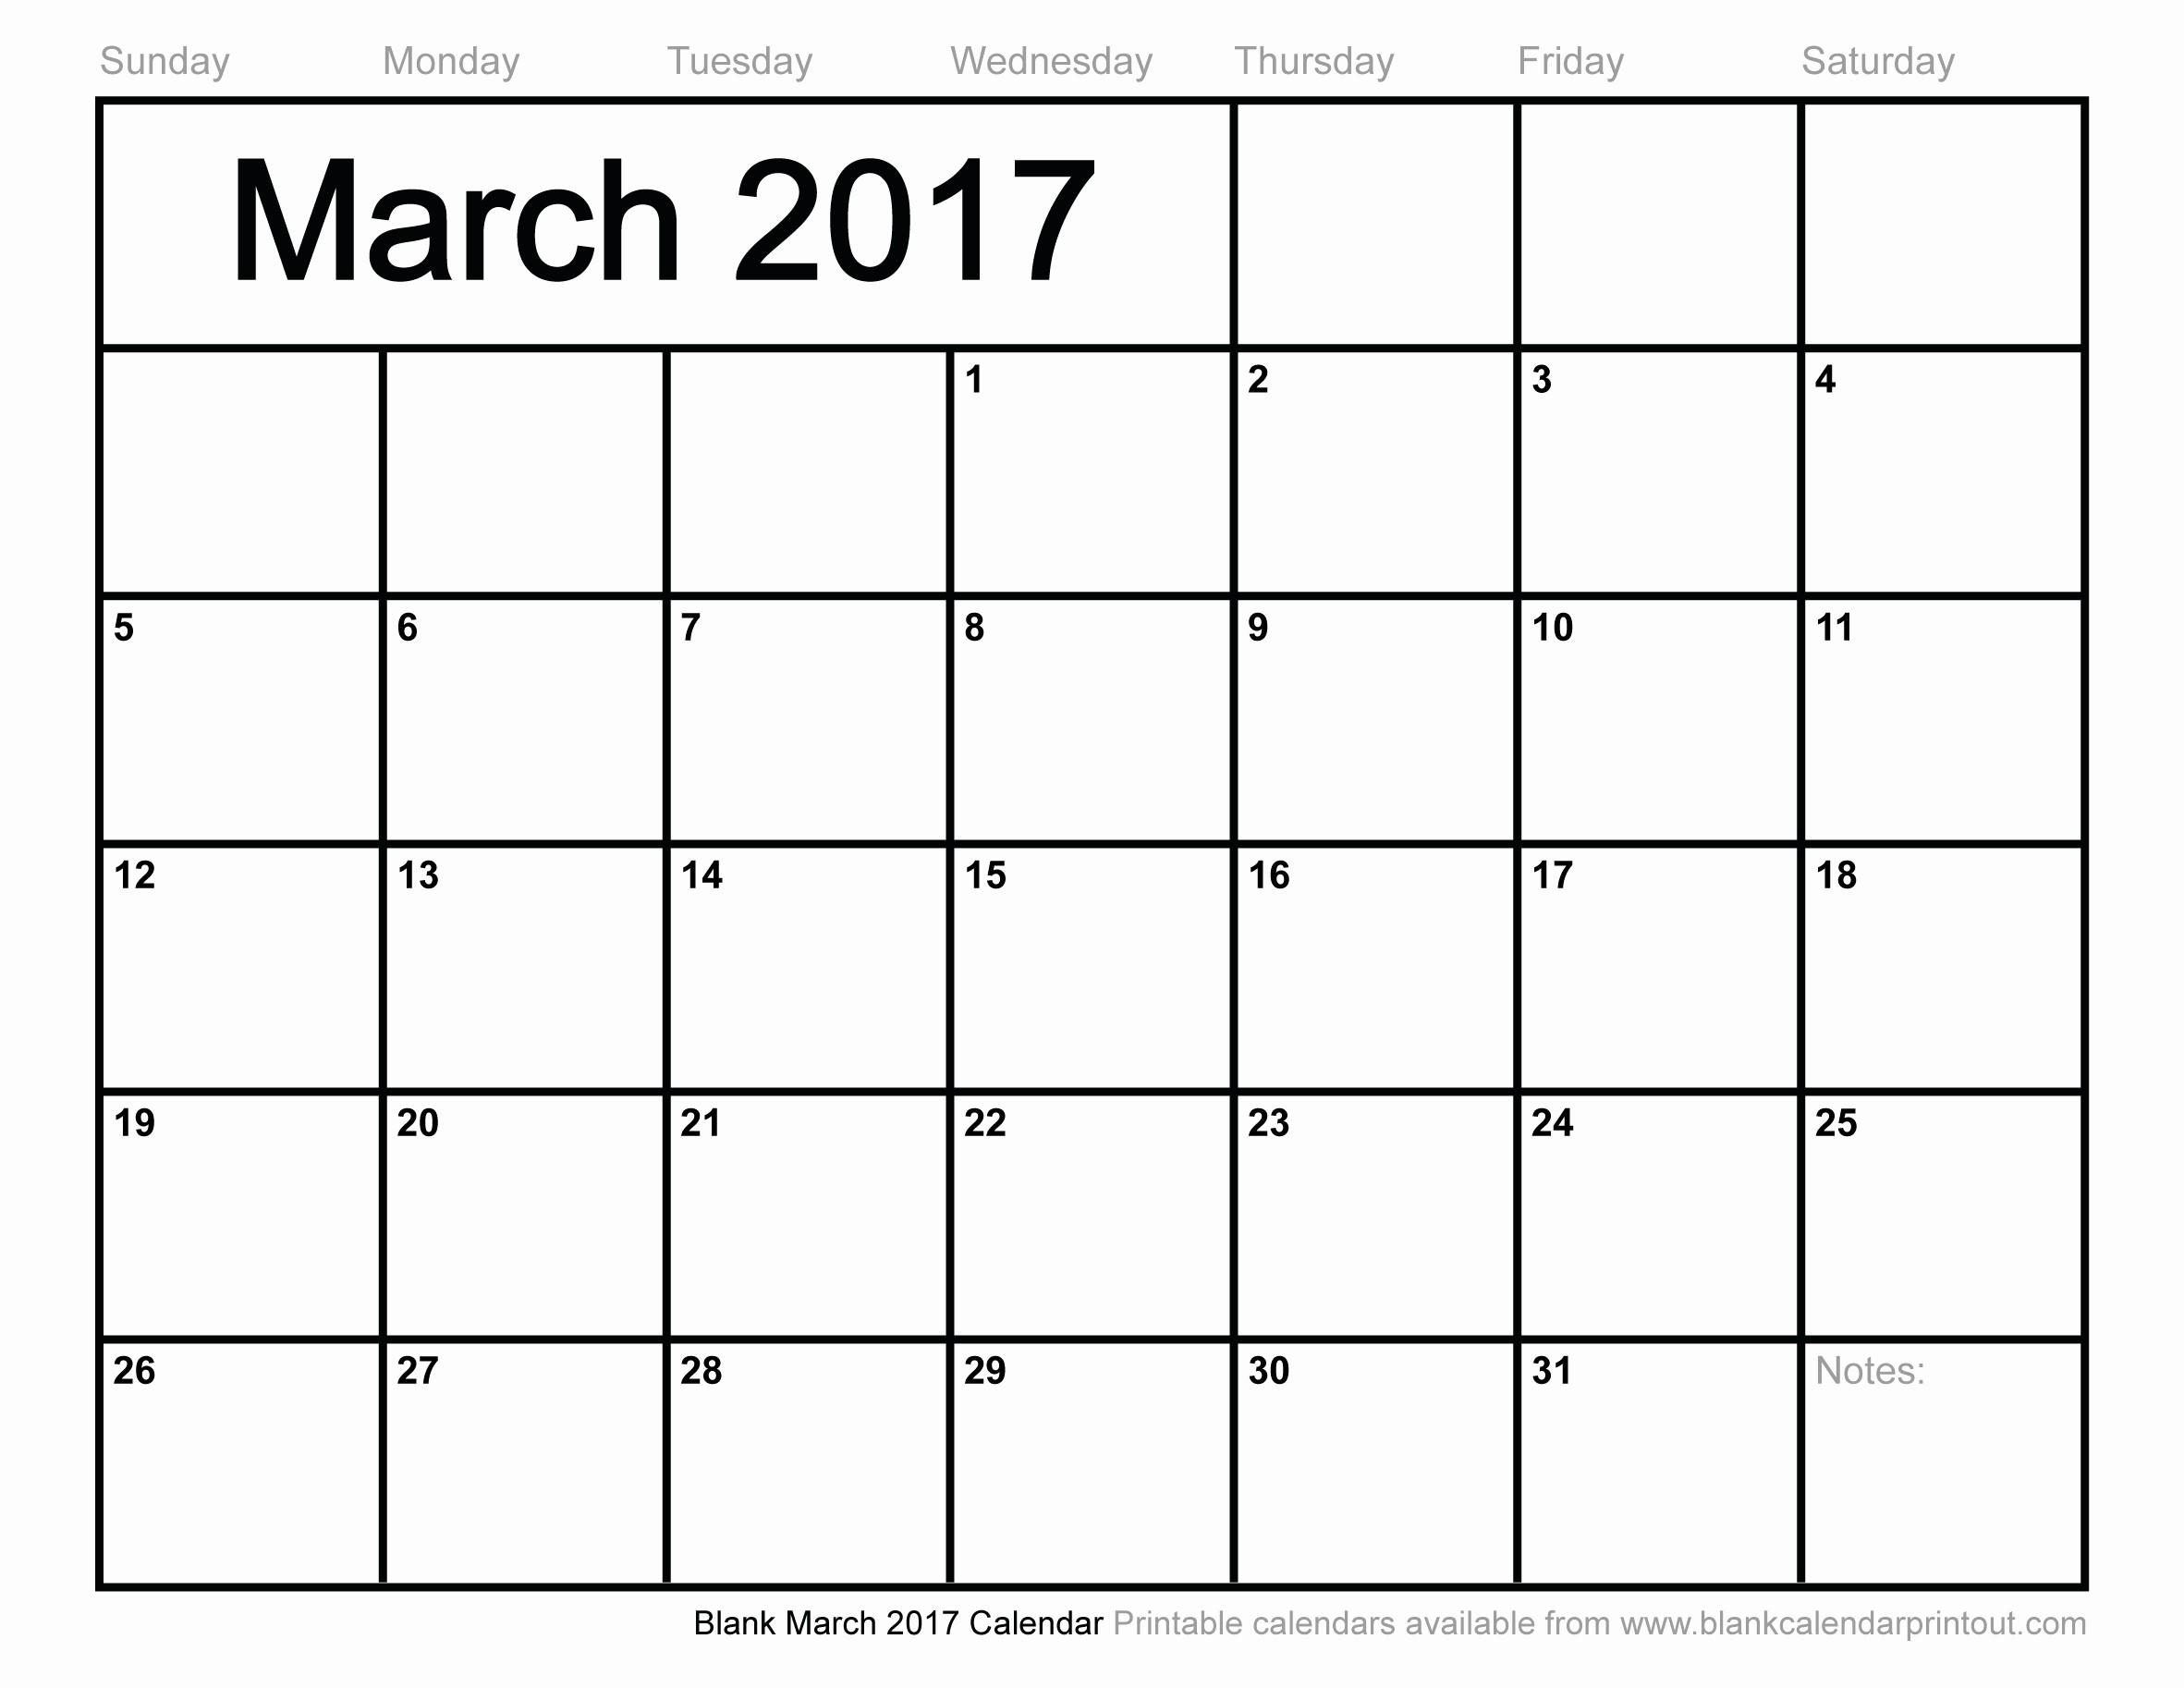 Blank Monthly Calendar 2017 Printable Best Of Blank March 2017 Calendar to Print